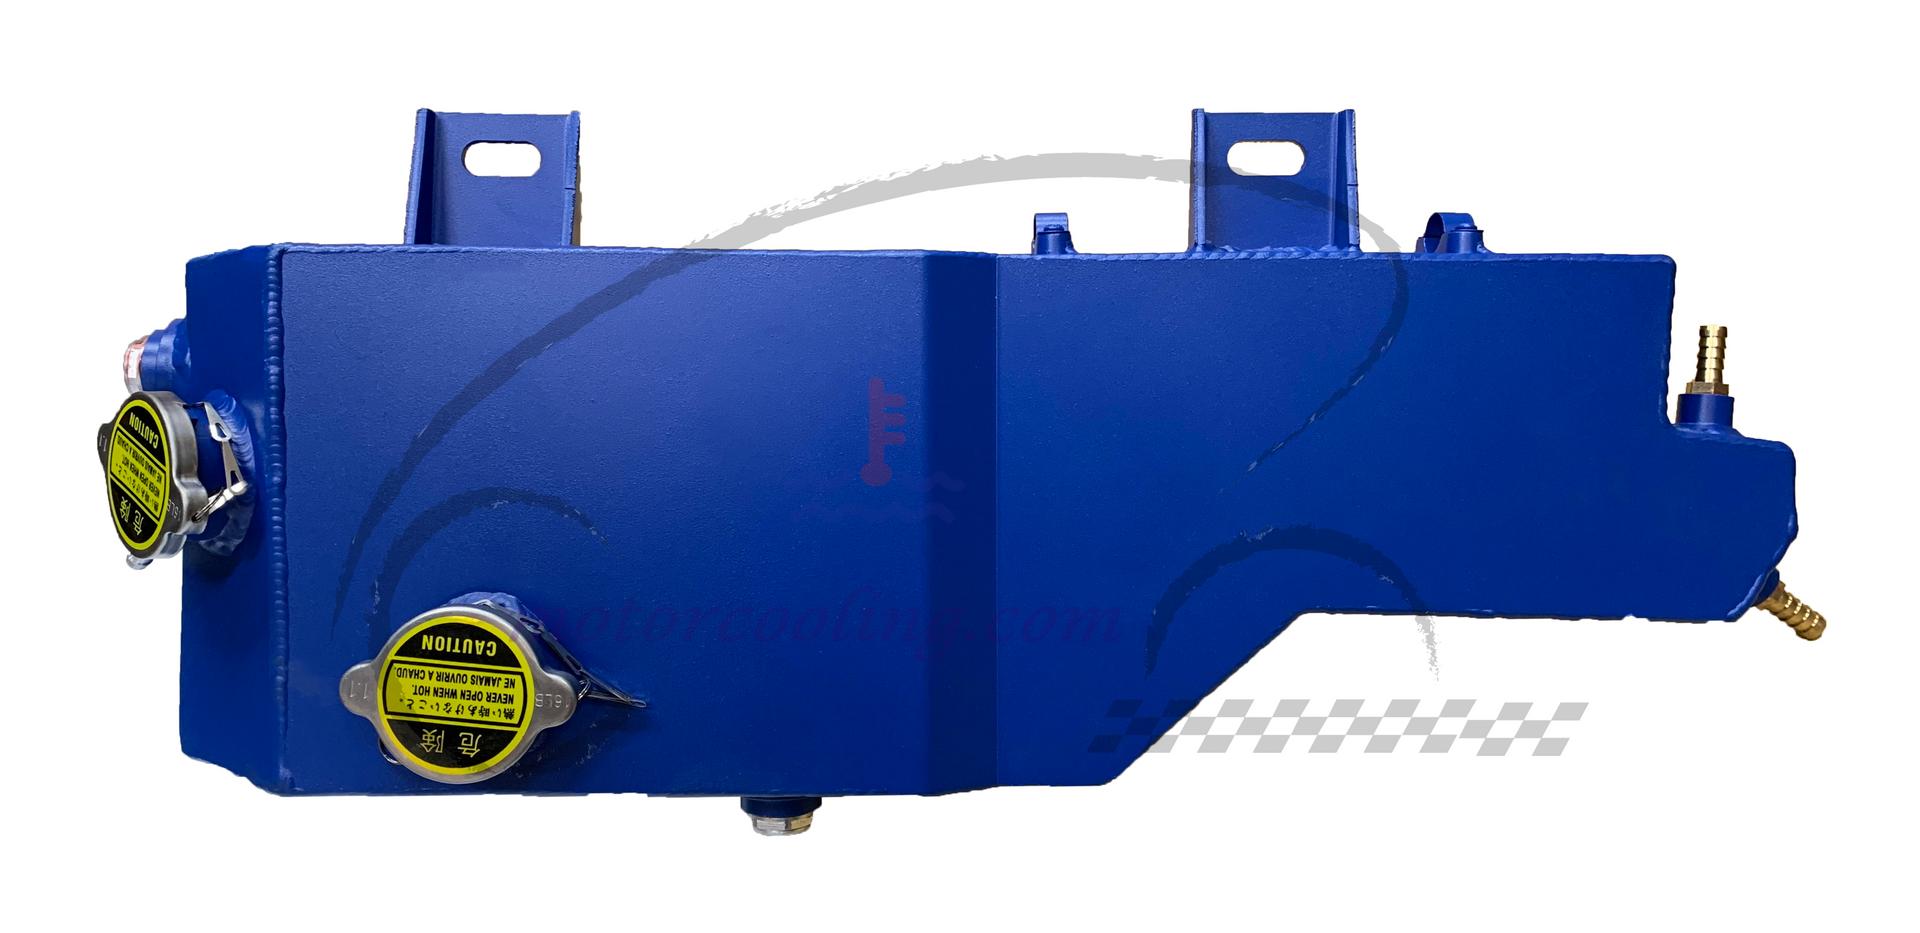 Freightliner Aluminum Surge Tank Top.png